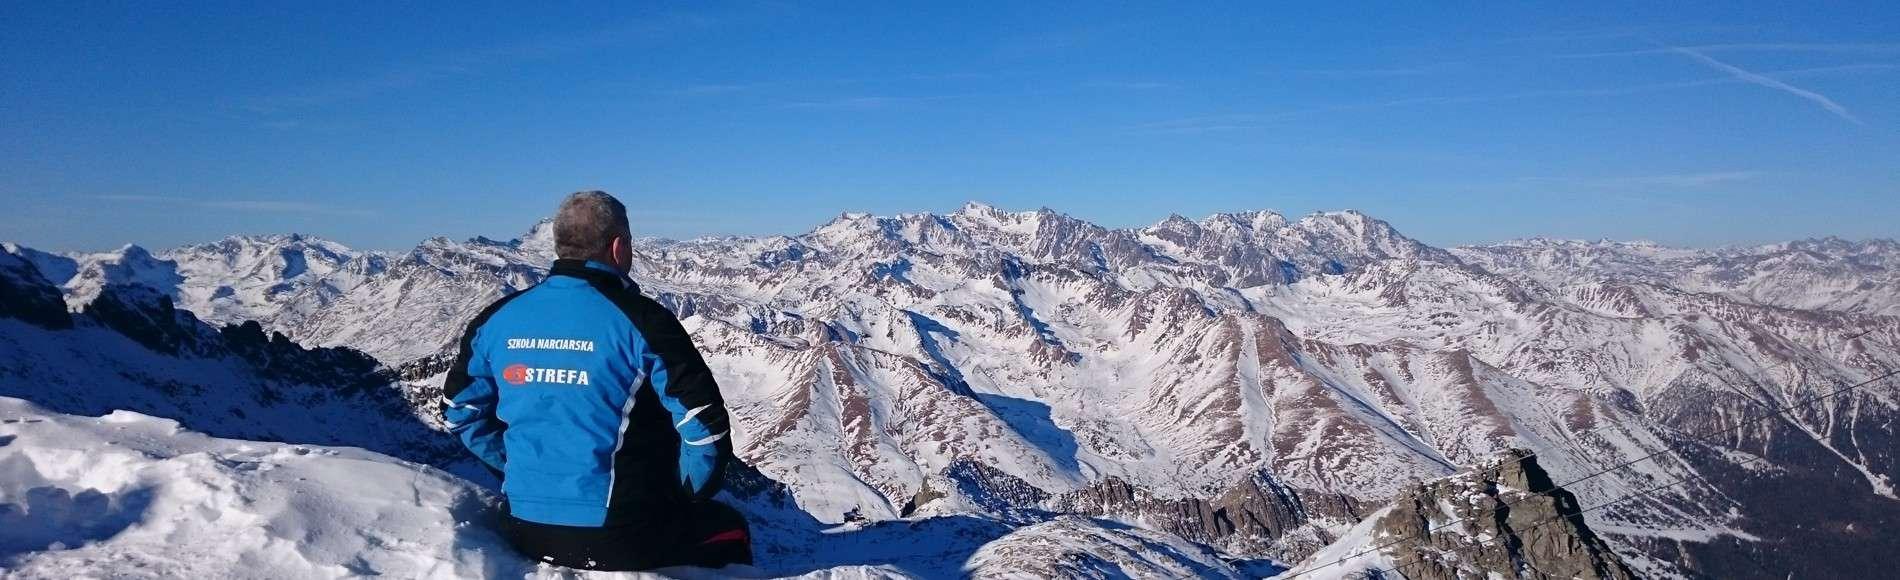 Szkoła narciarska STREFA